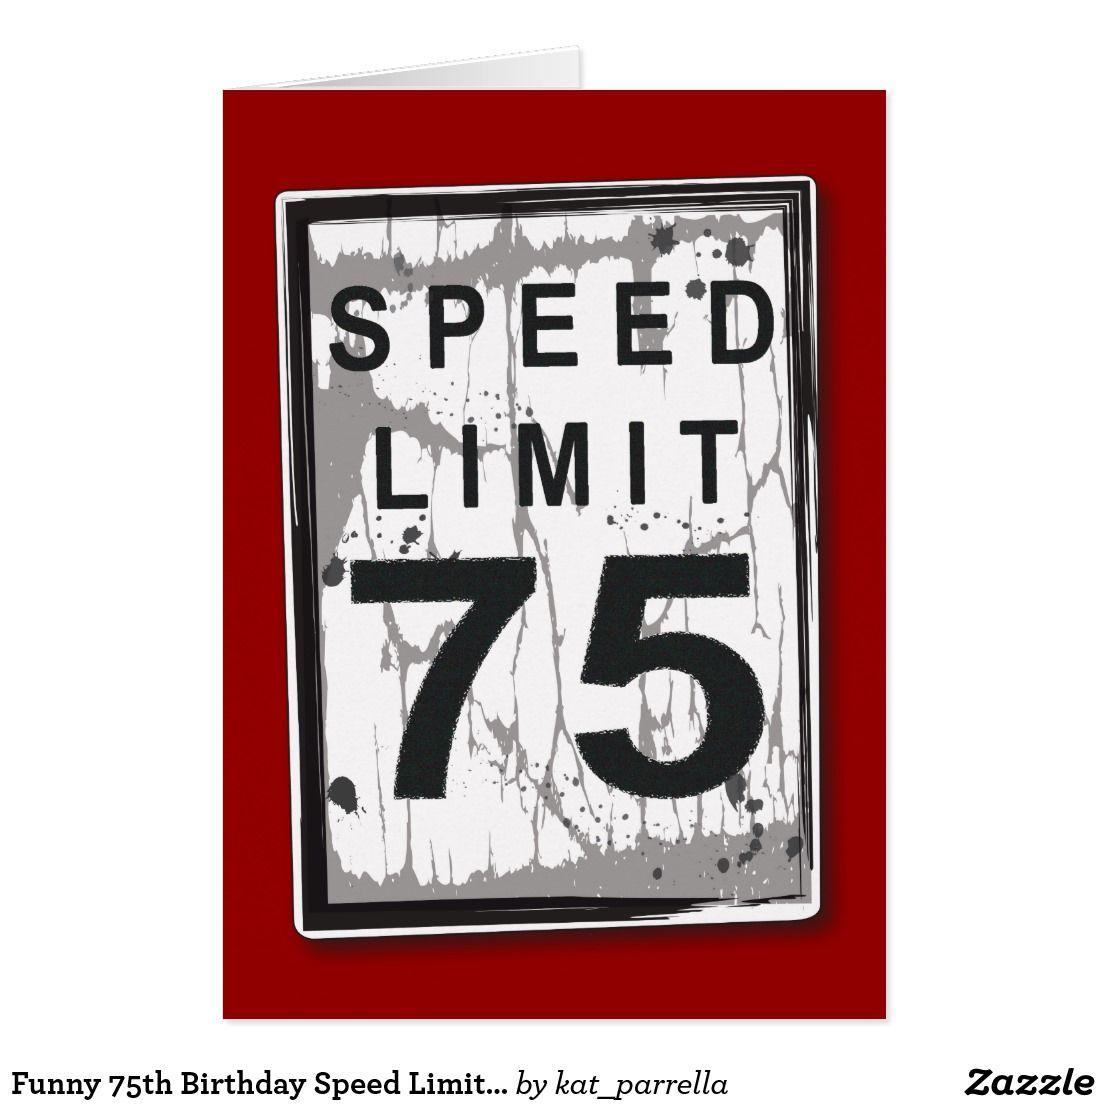 Funny 75th Birthday Speed Limit Card | Pinterest | Birthdays